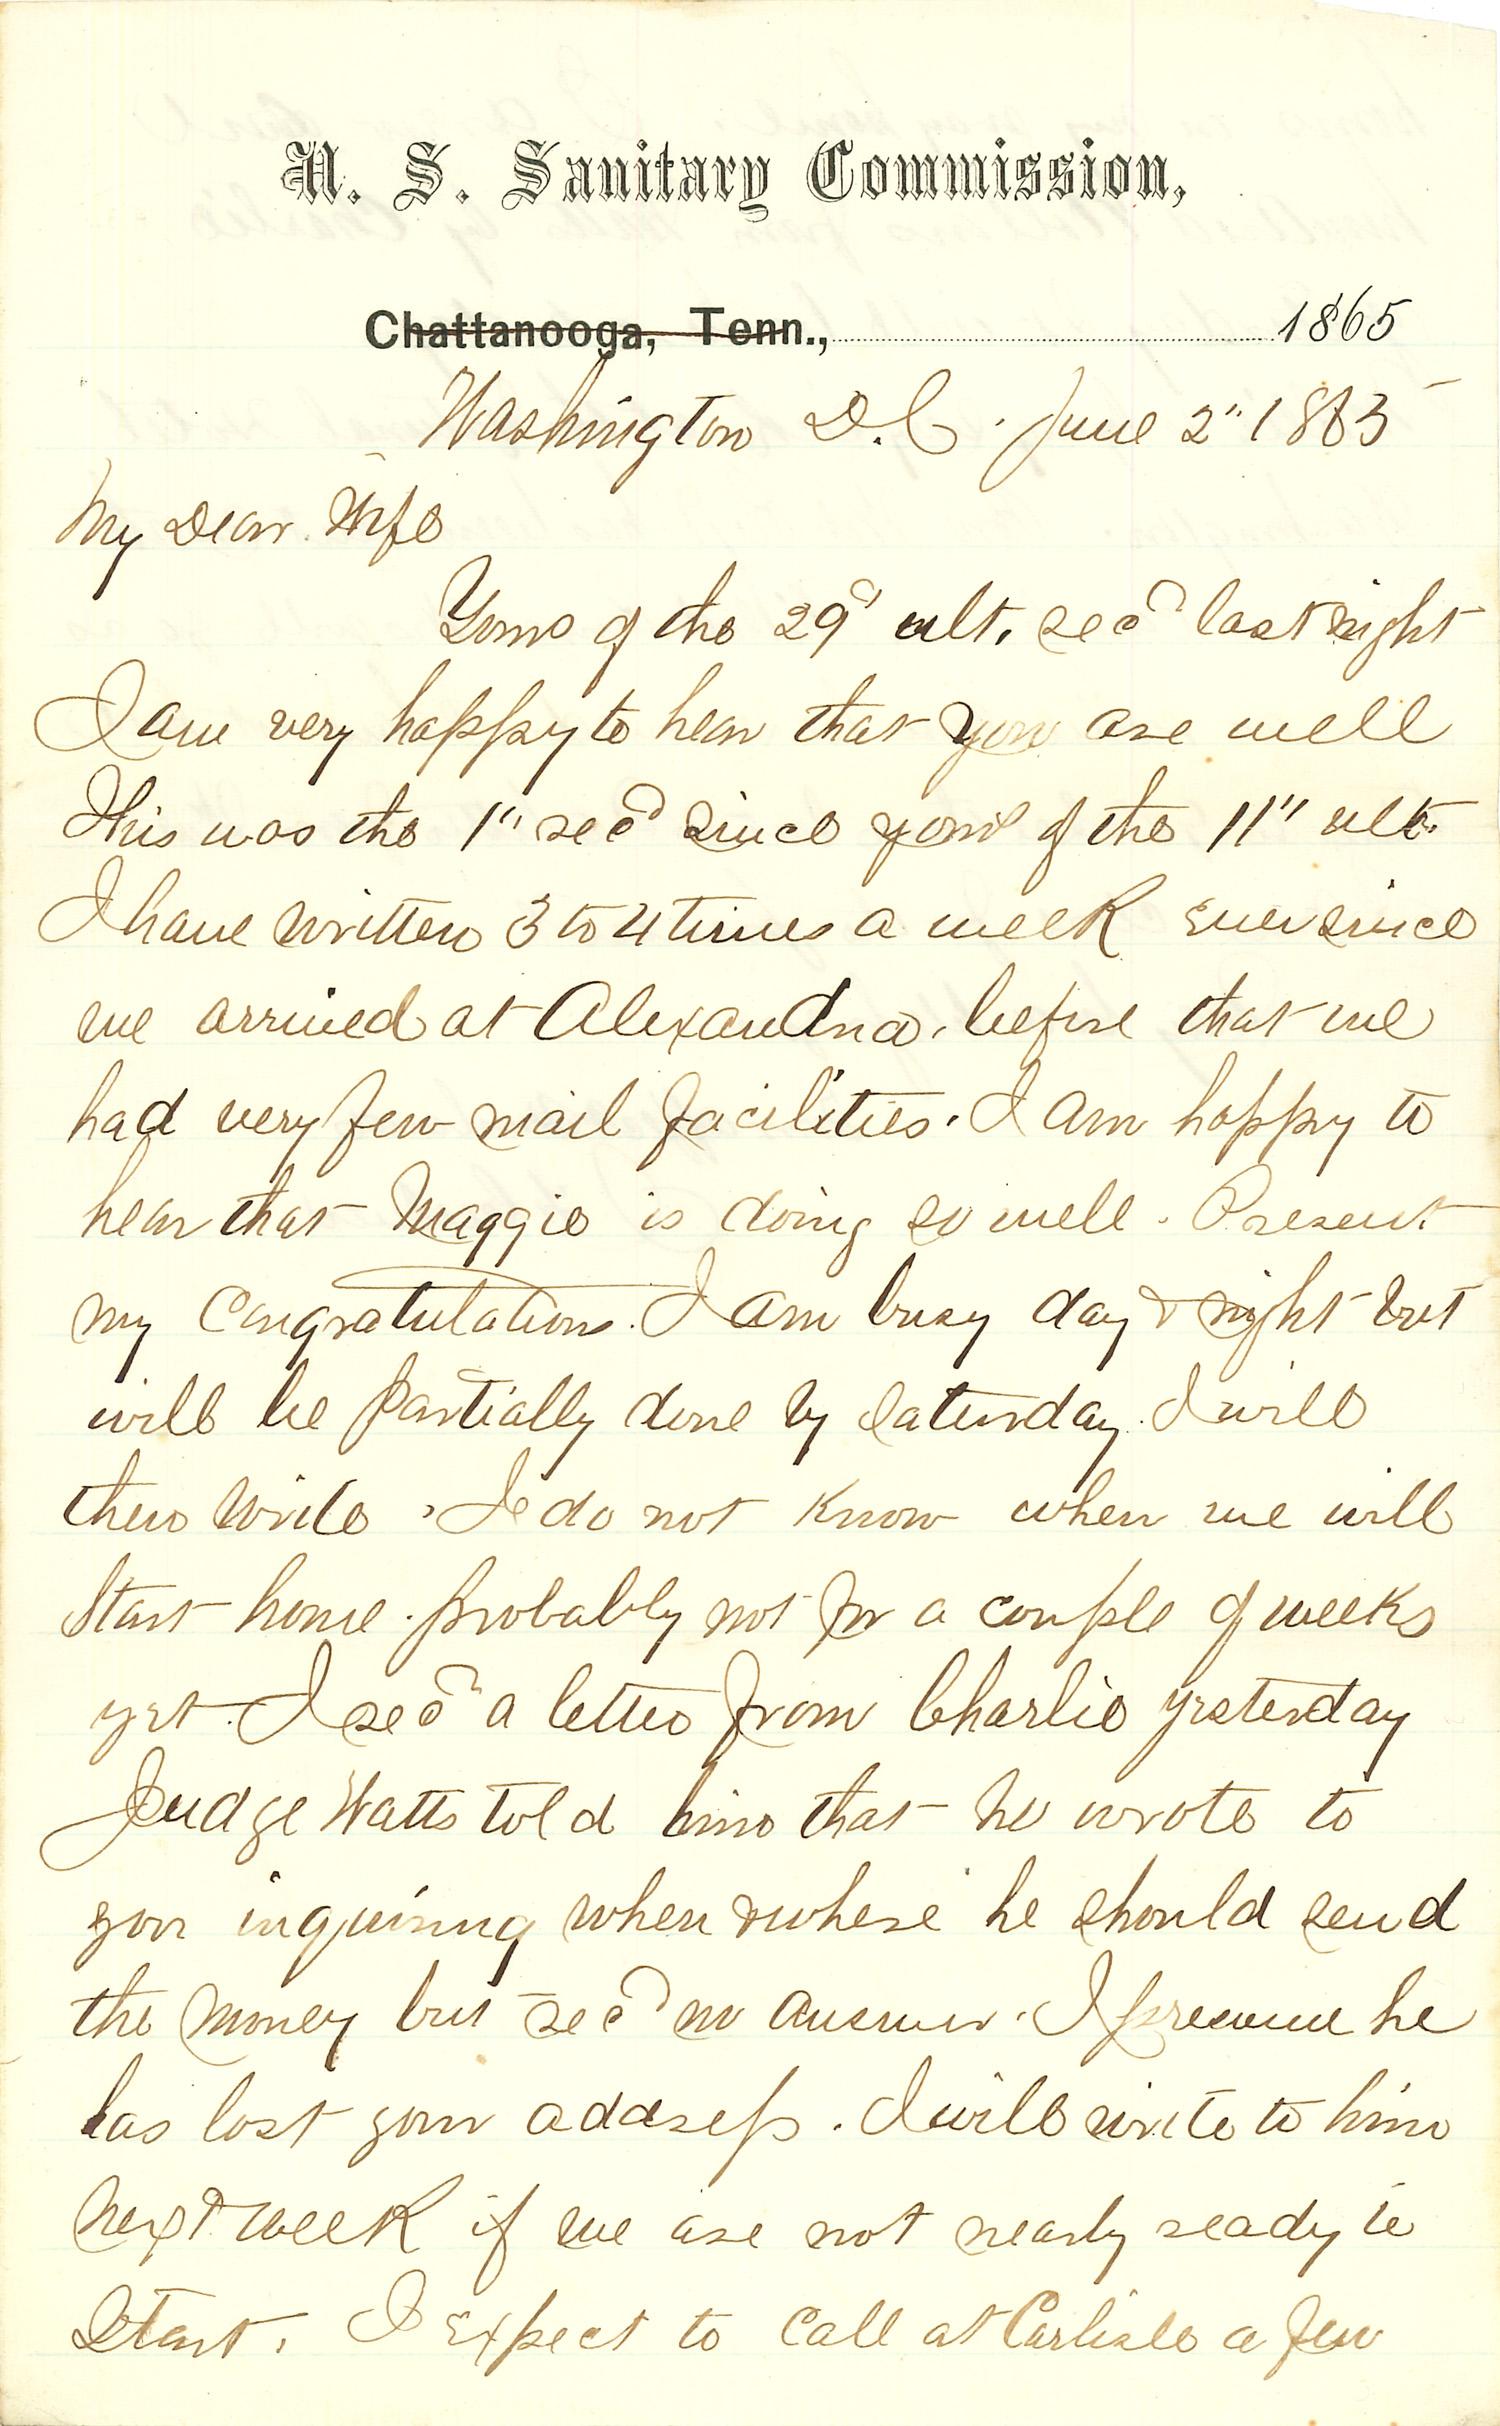 Joseph Culver Letter, June 2, 1865, Page 1